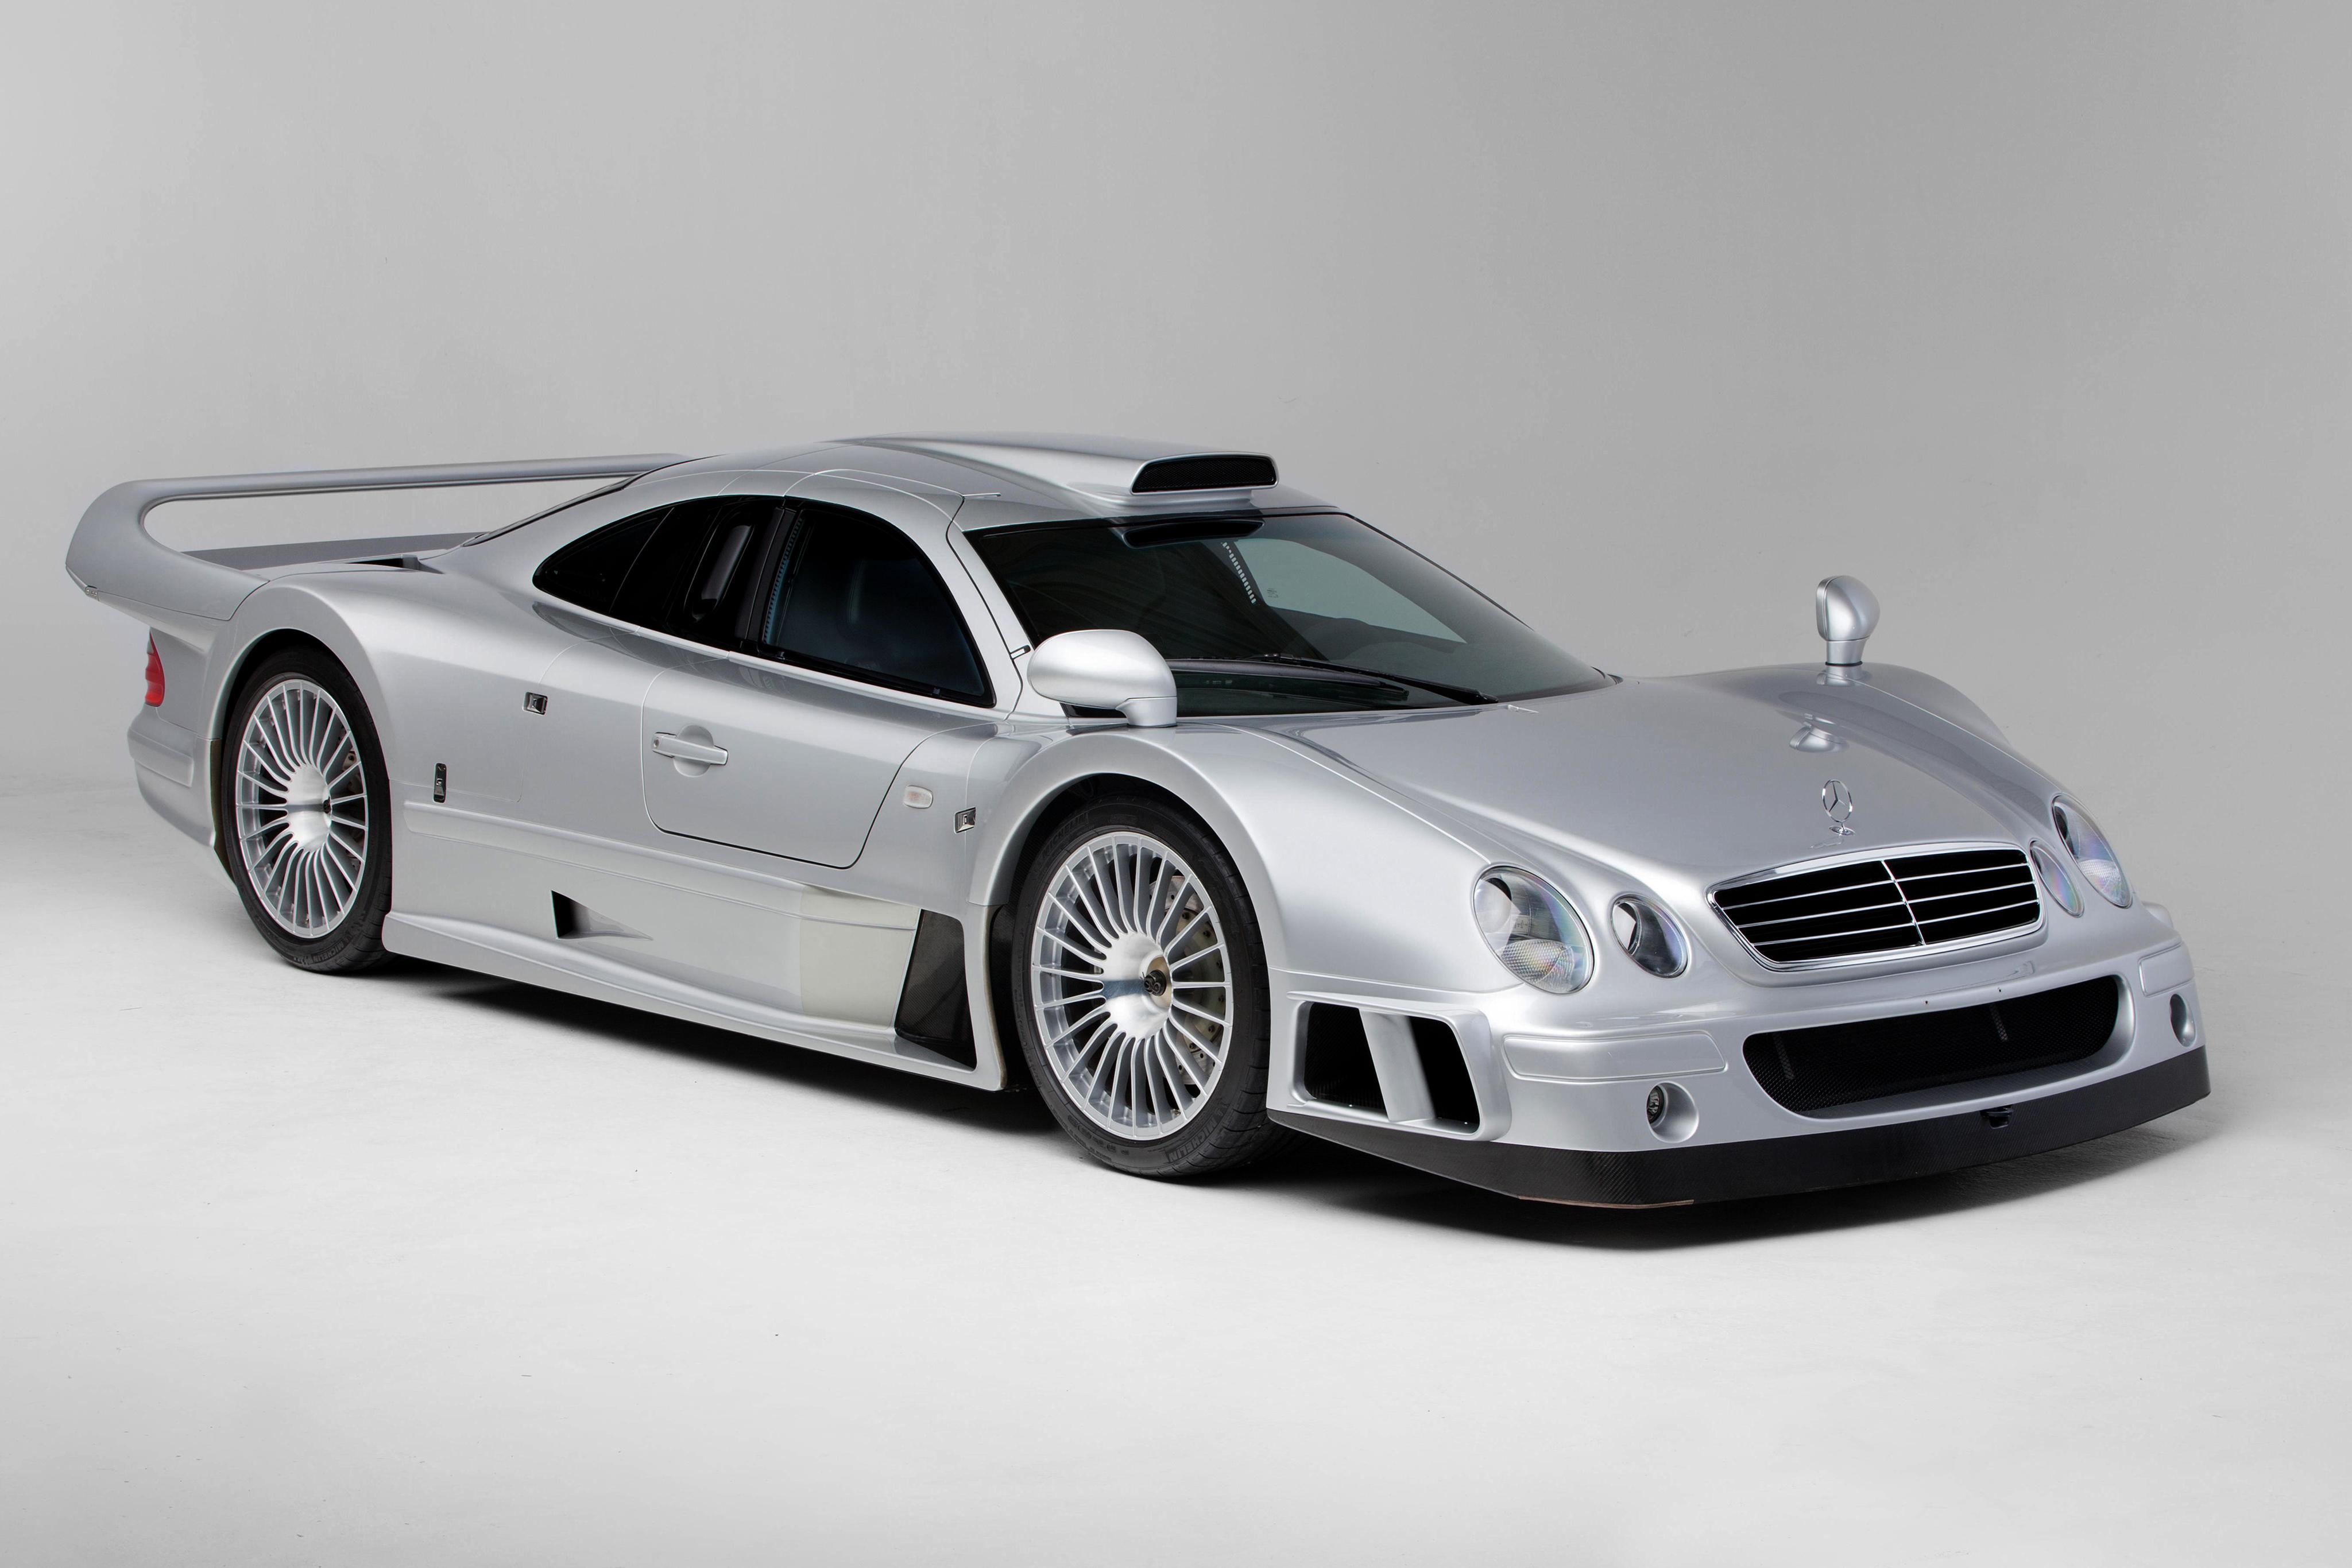 Mercedes Benz Clk Gtr wallpapers, Vehicles, HQ Mercedes ...